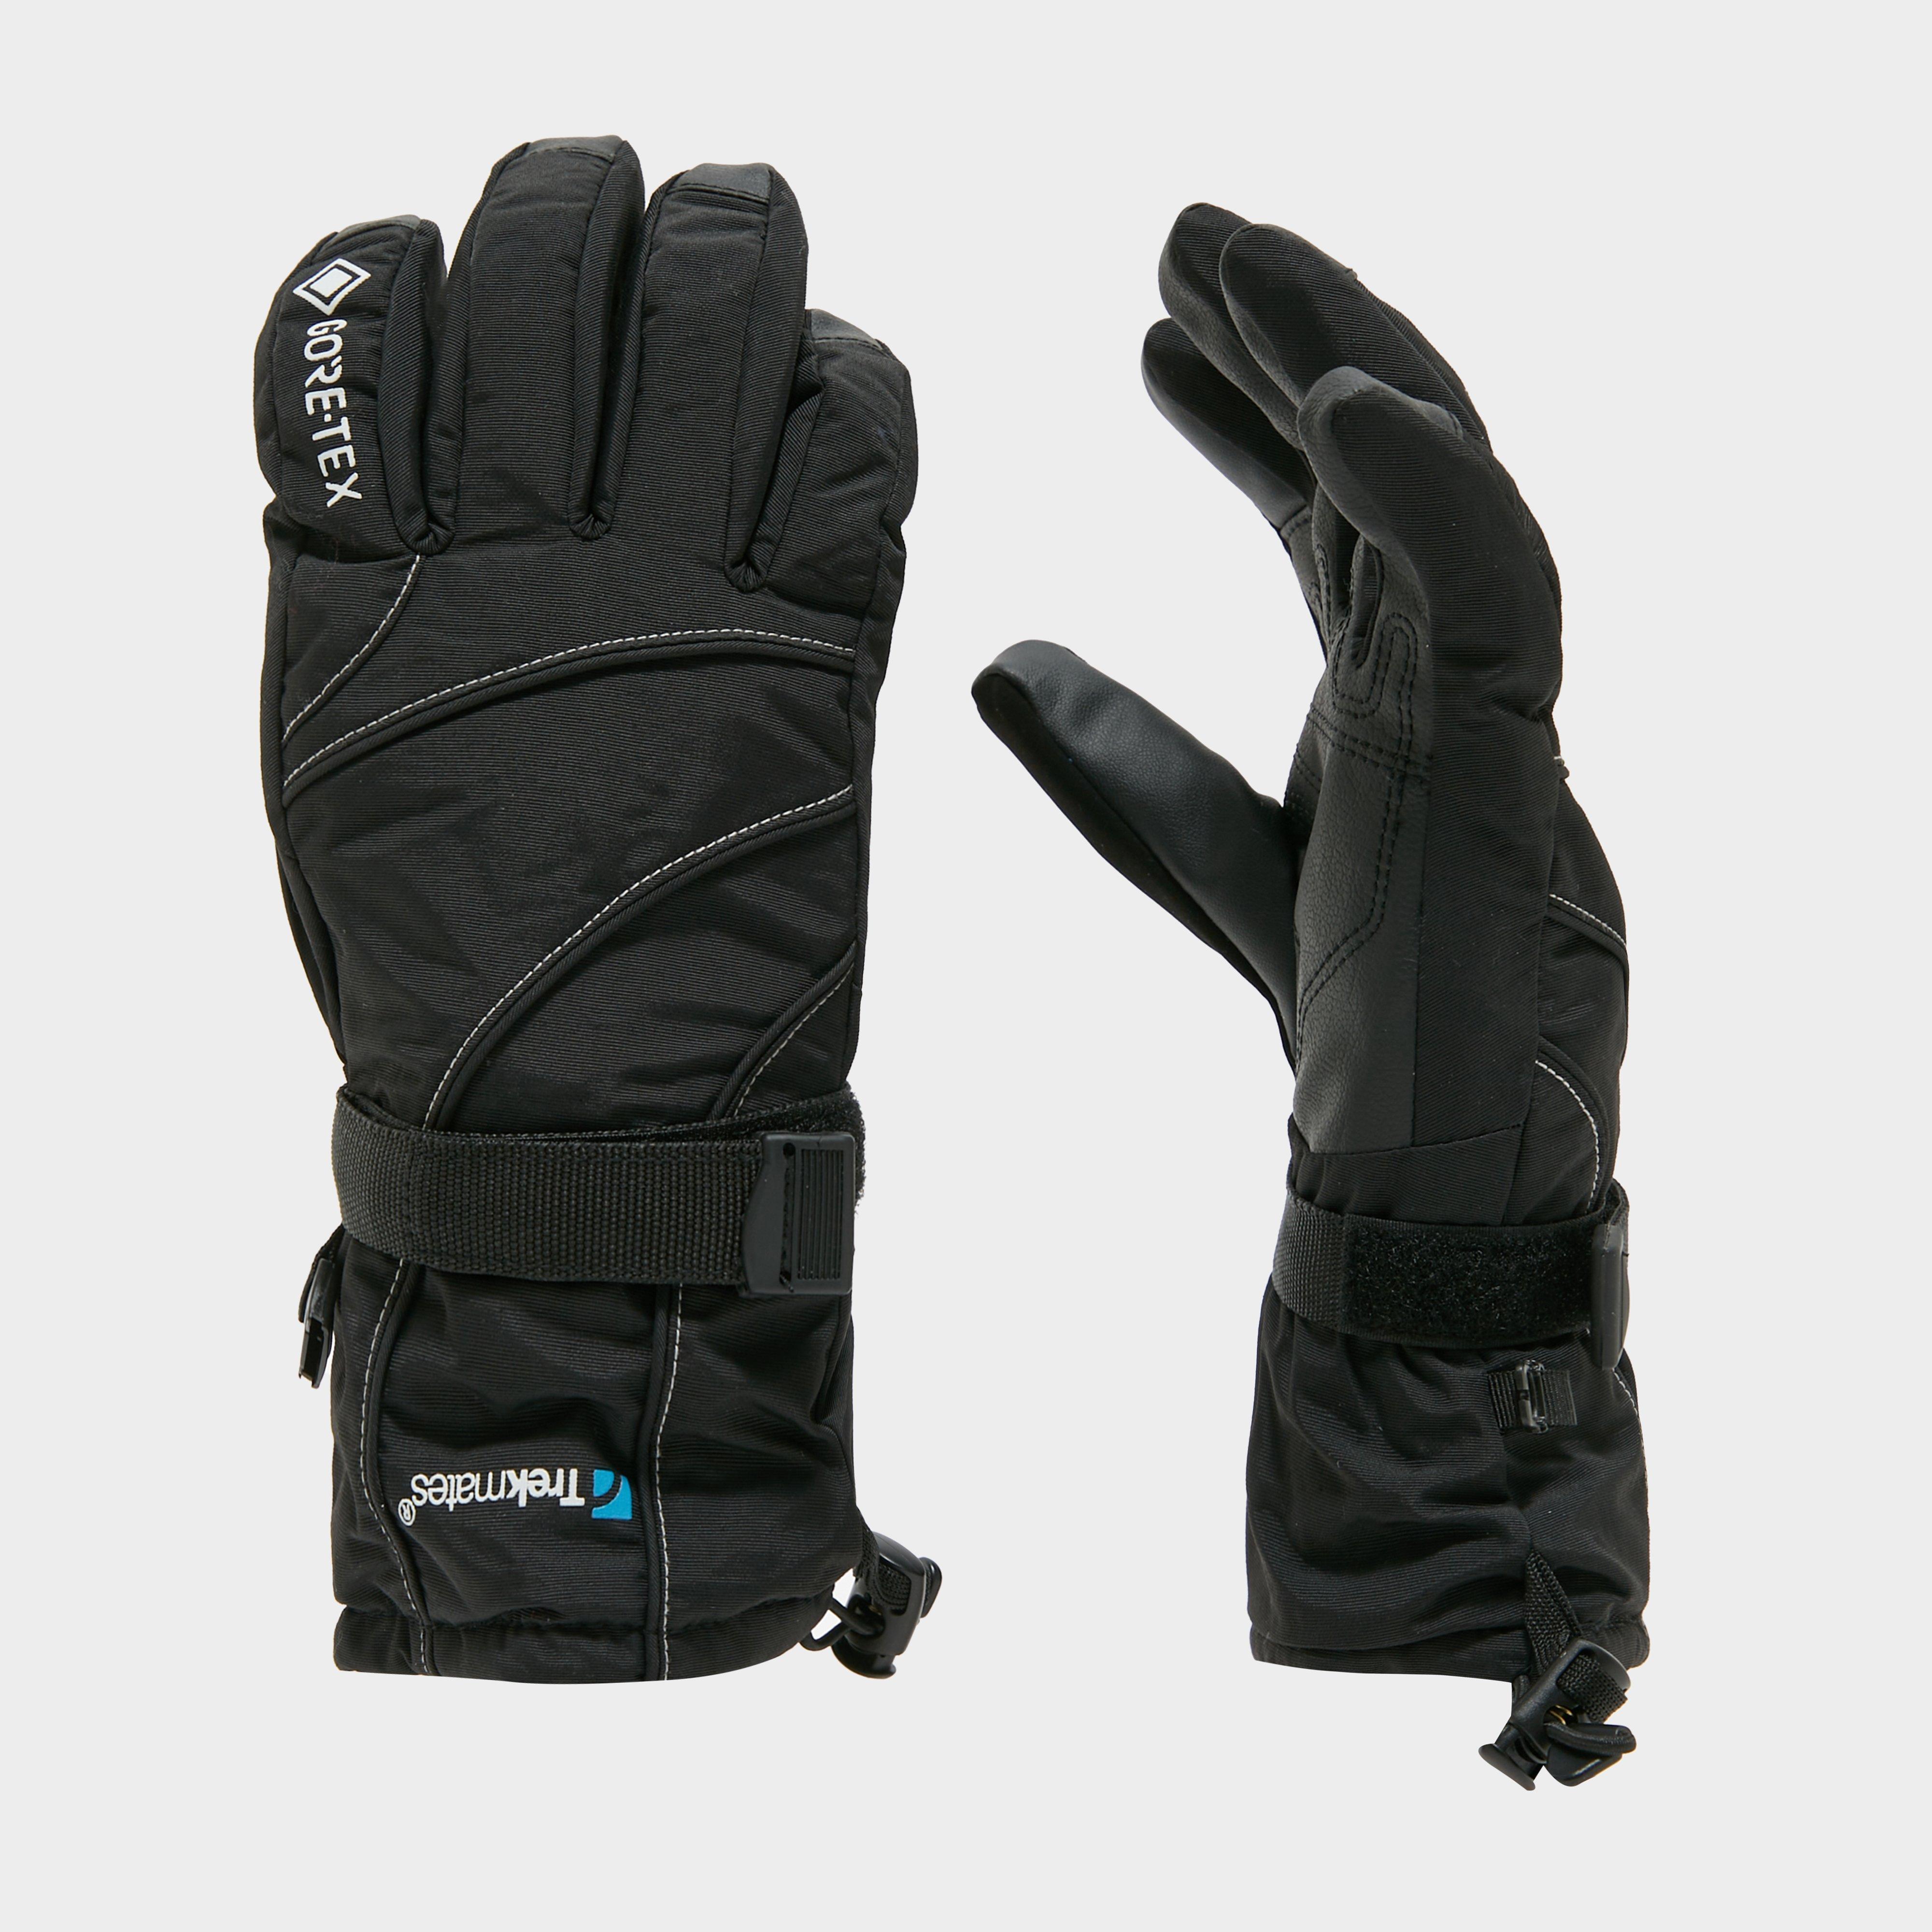 Trekmates Protek Gtx+ Active Gloves - Black/Glove, Black